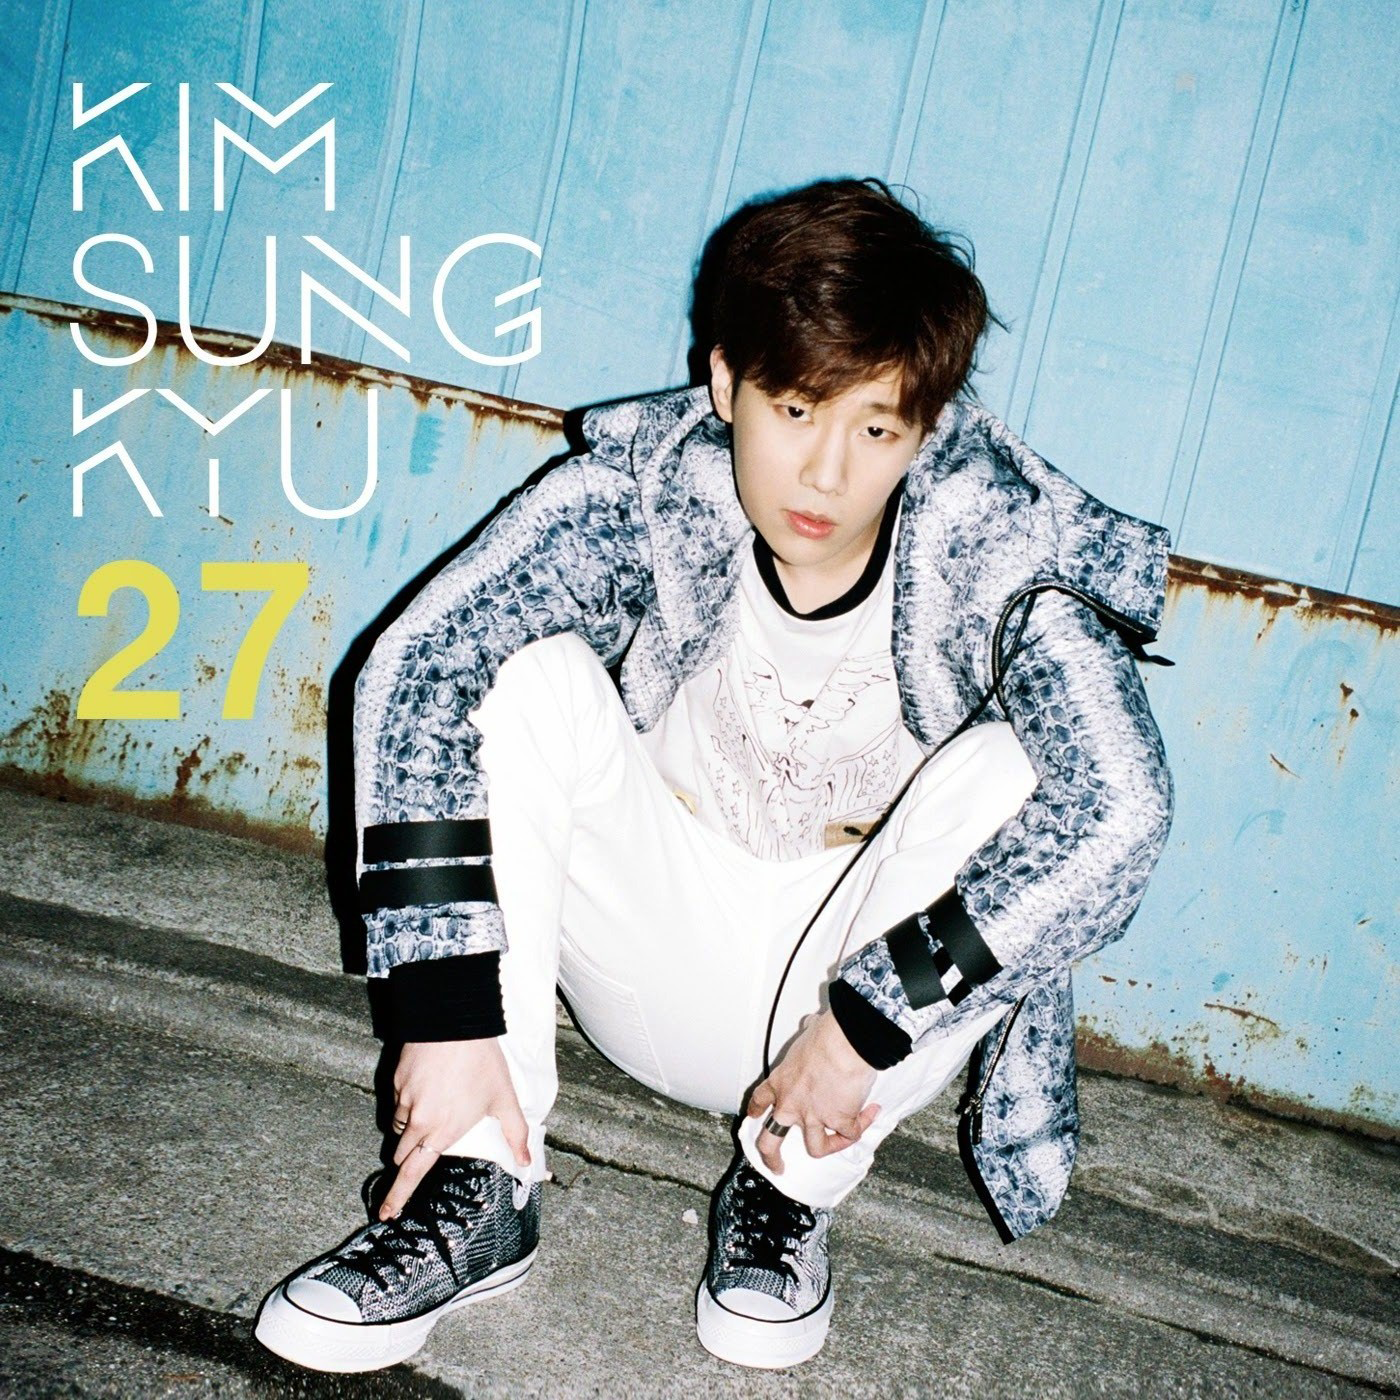 27 (Sung Kyu)